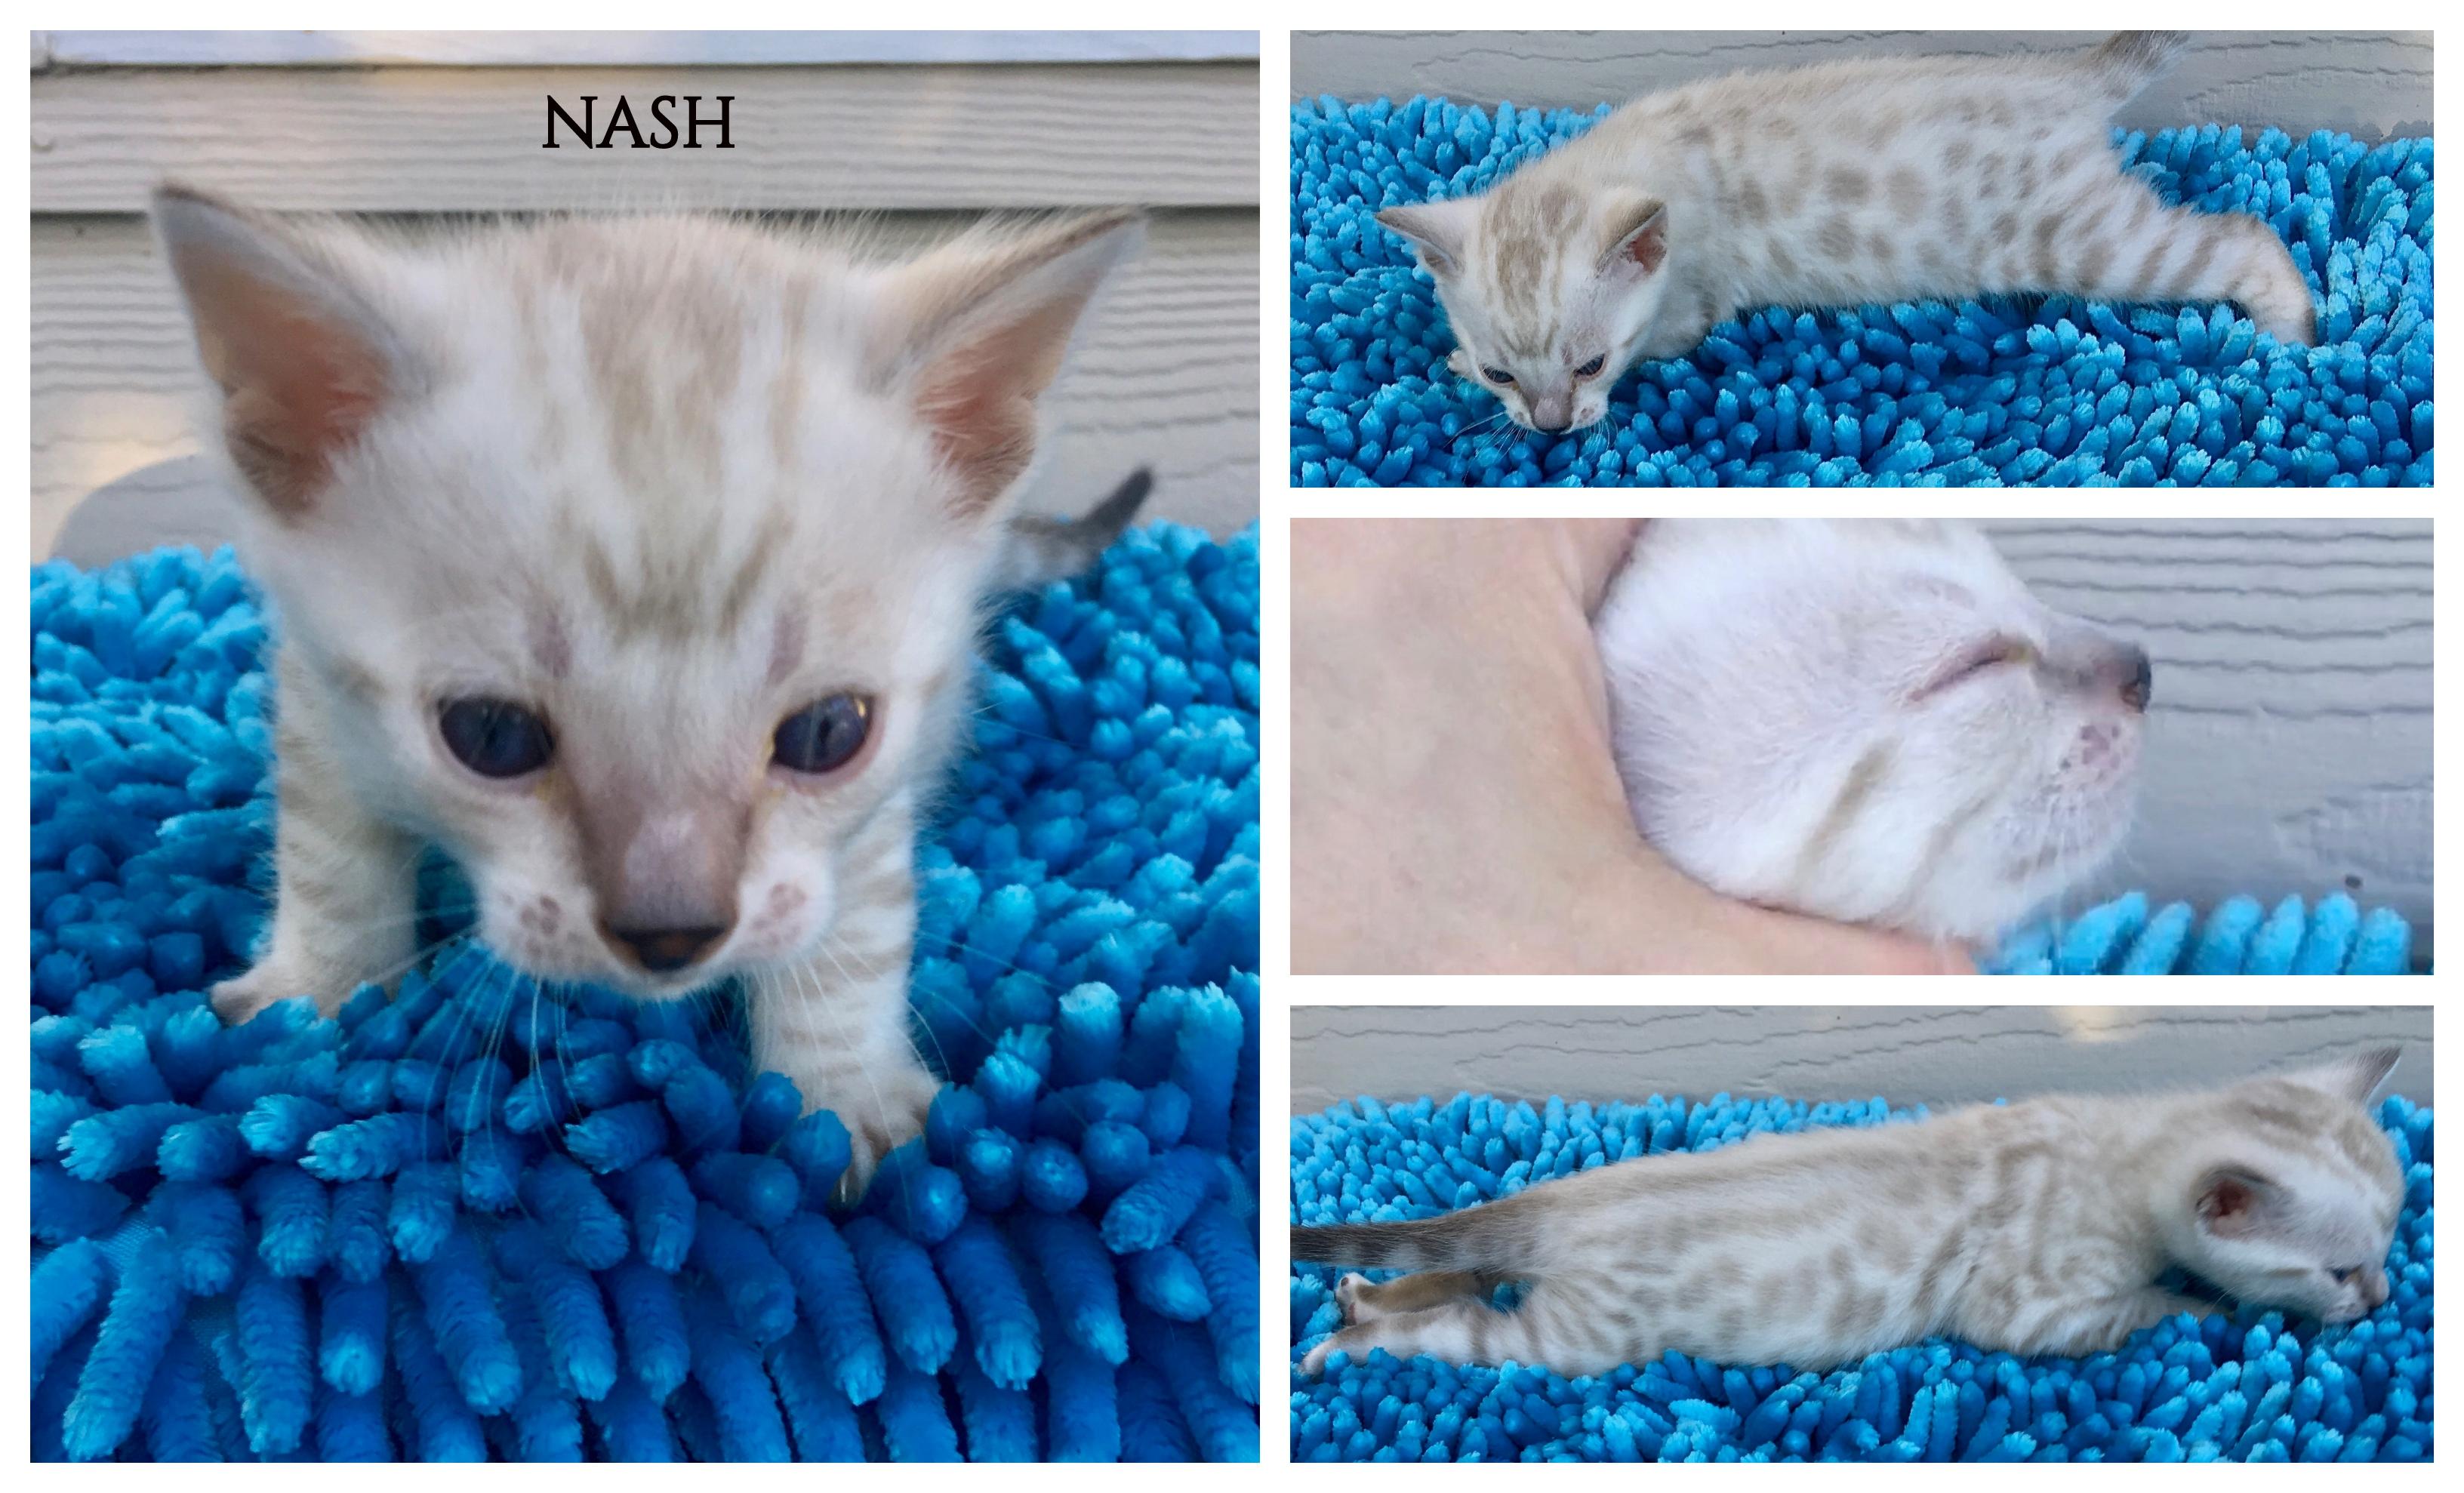 Nash 4 weeks